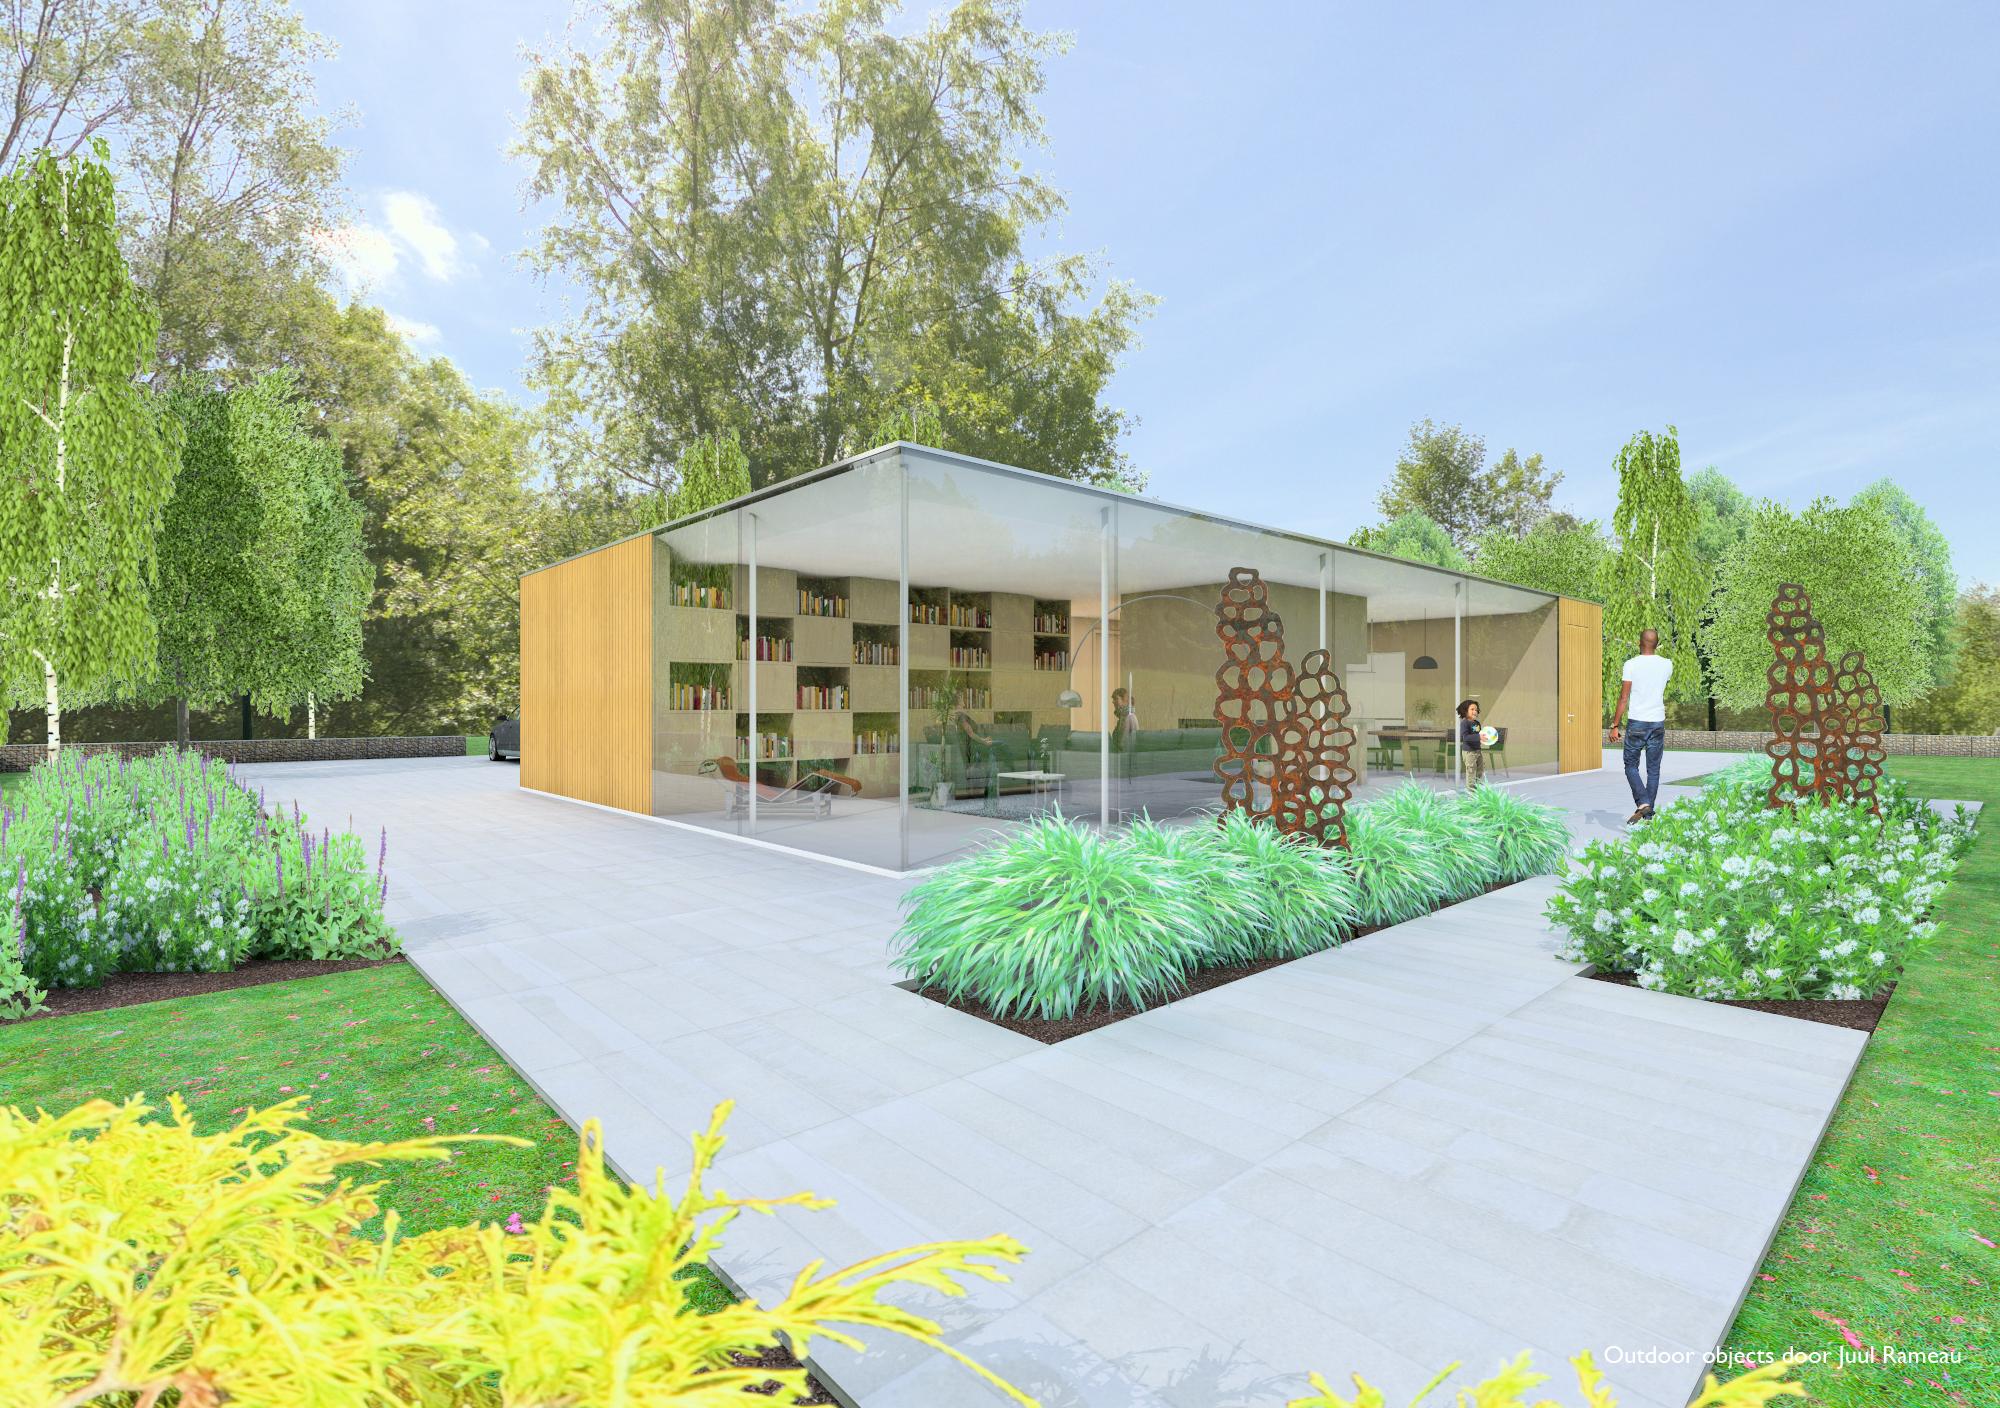 Architectuur ontwerp contact tuin